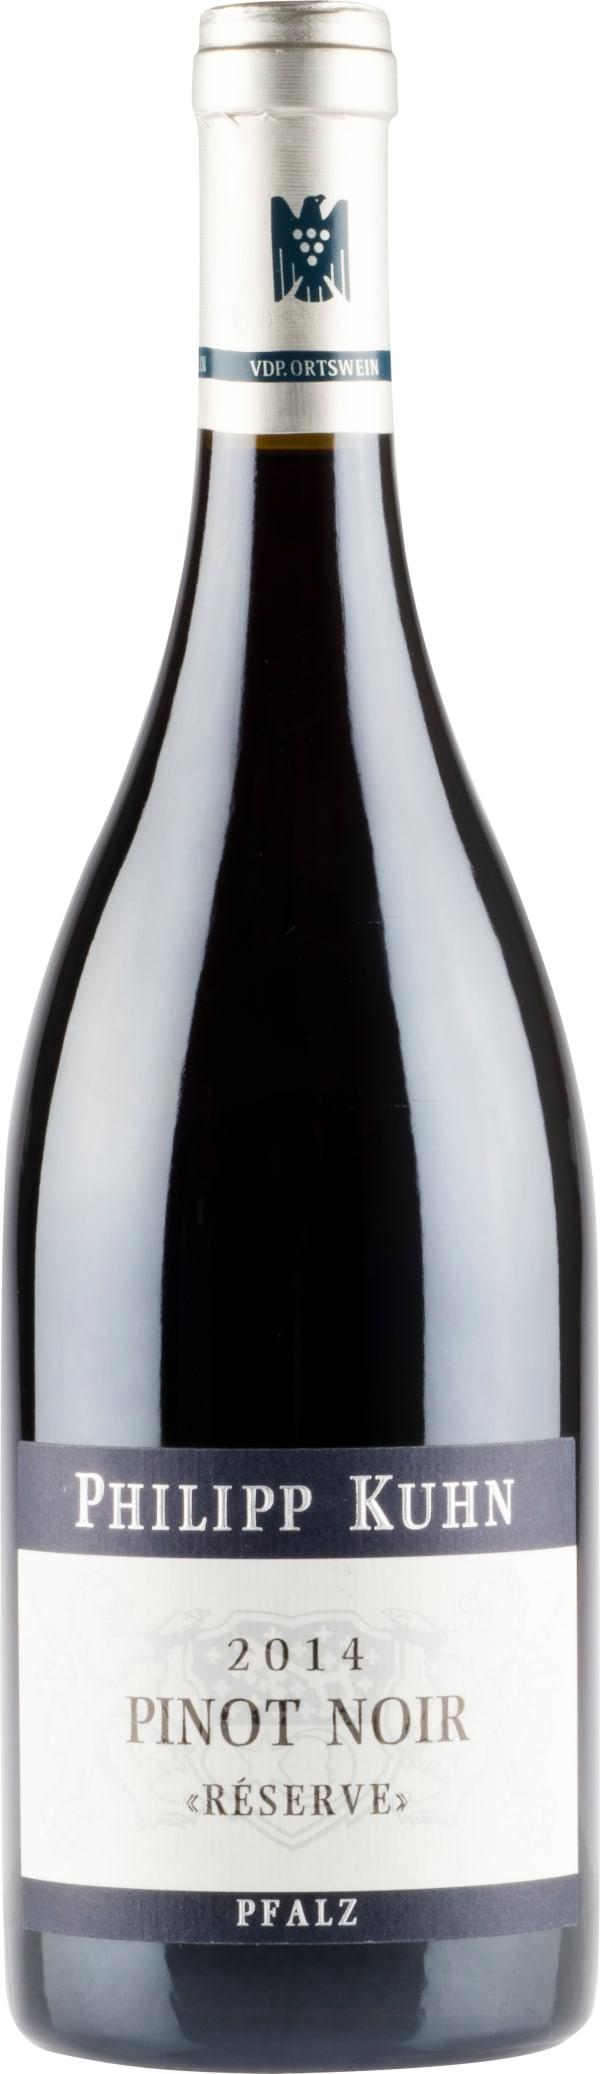 Philipp Kuhn Pinot Noir Laumersheimer Réserve 2016